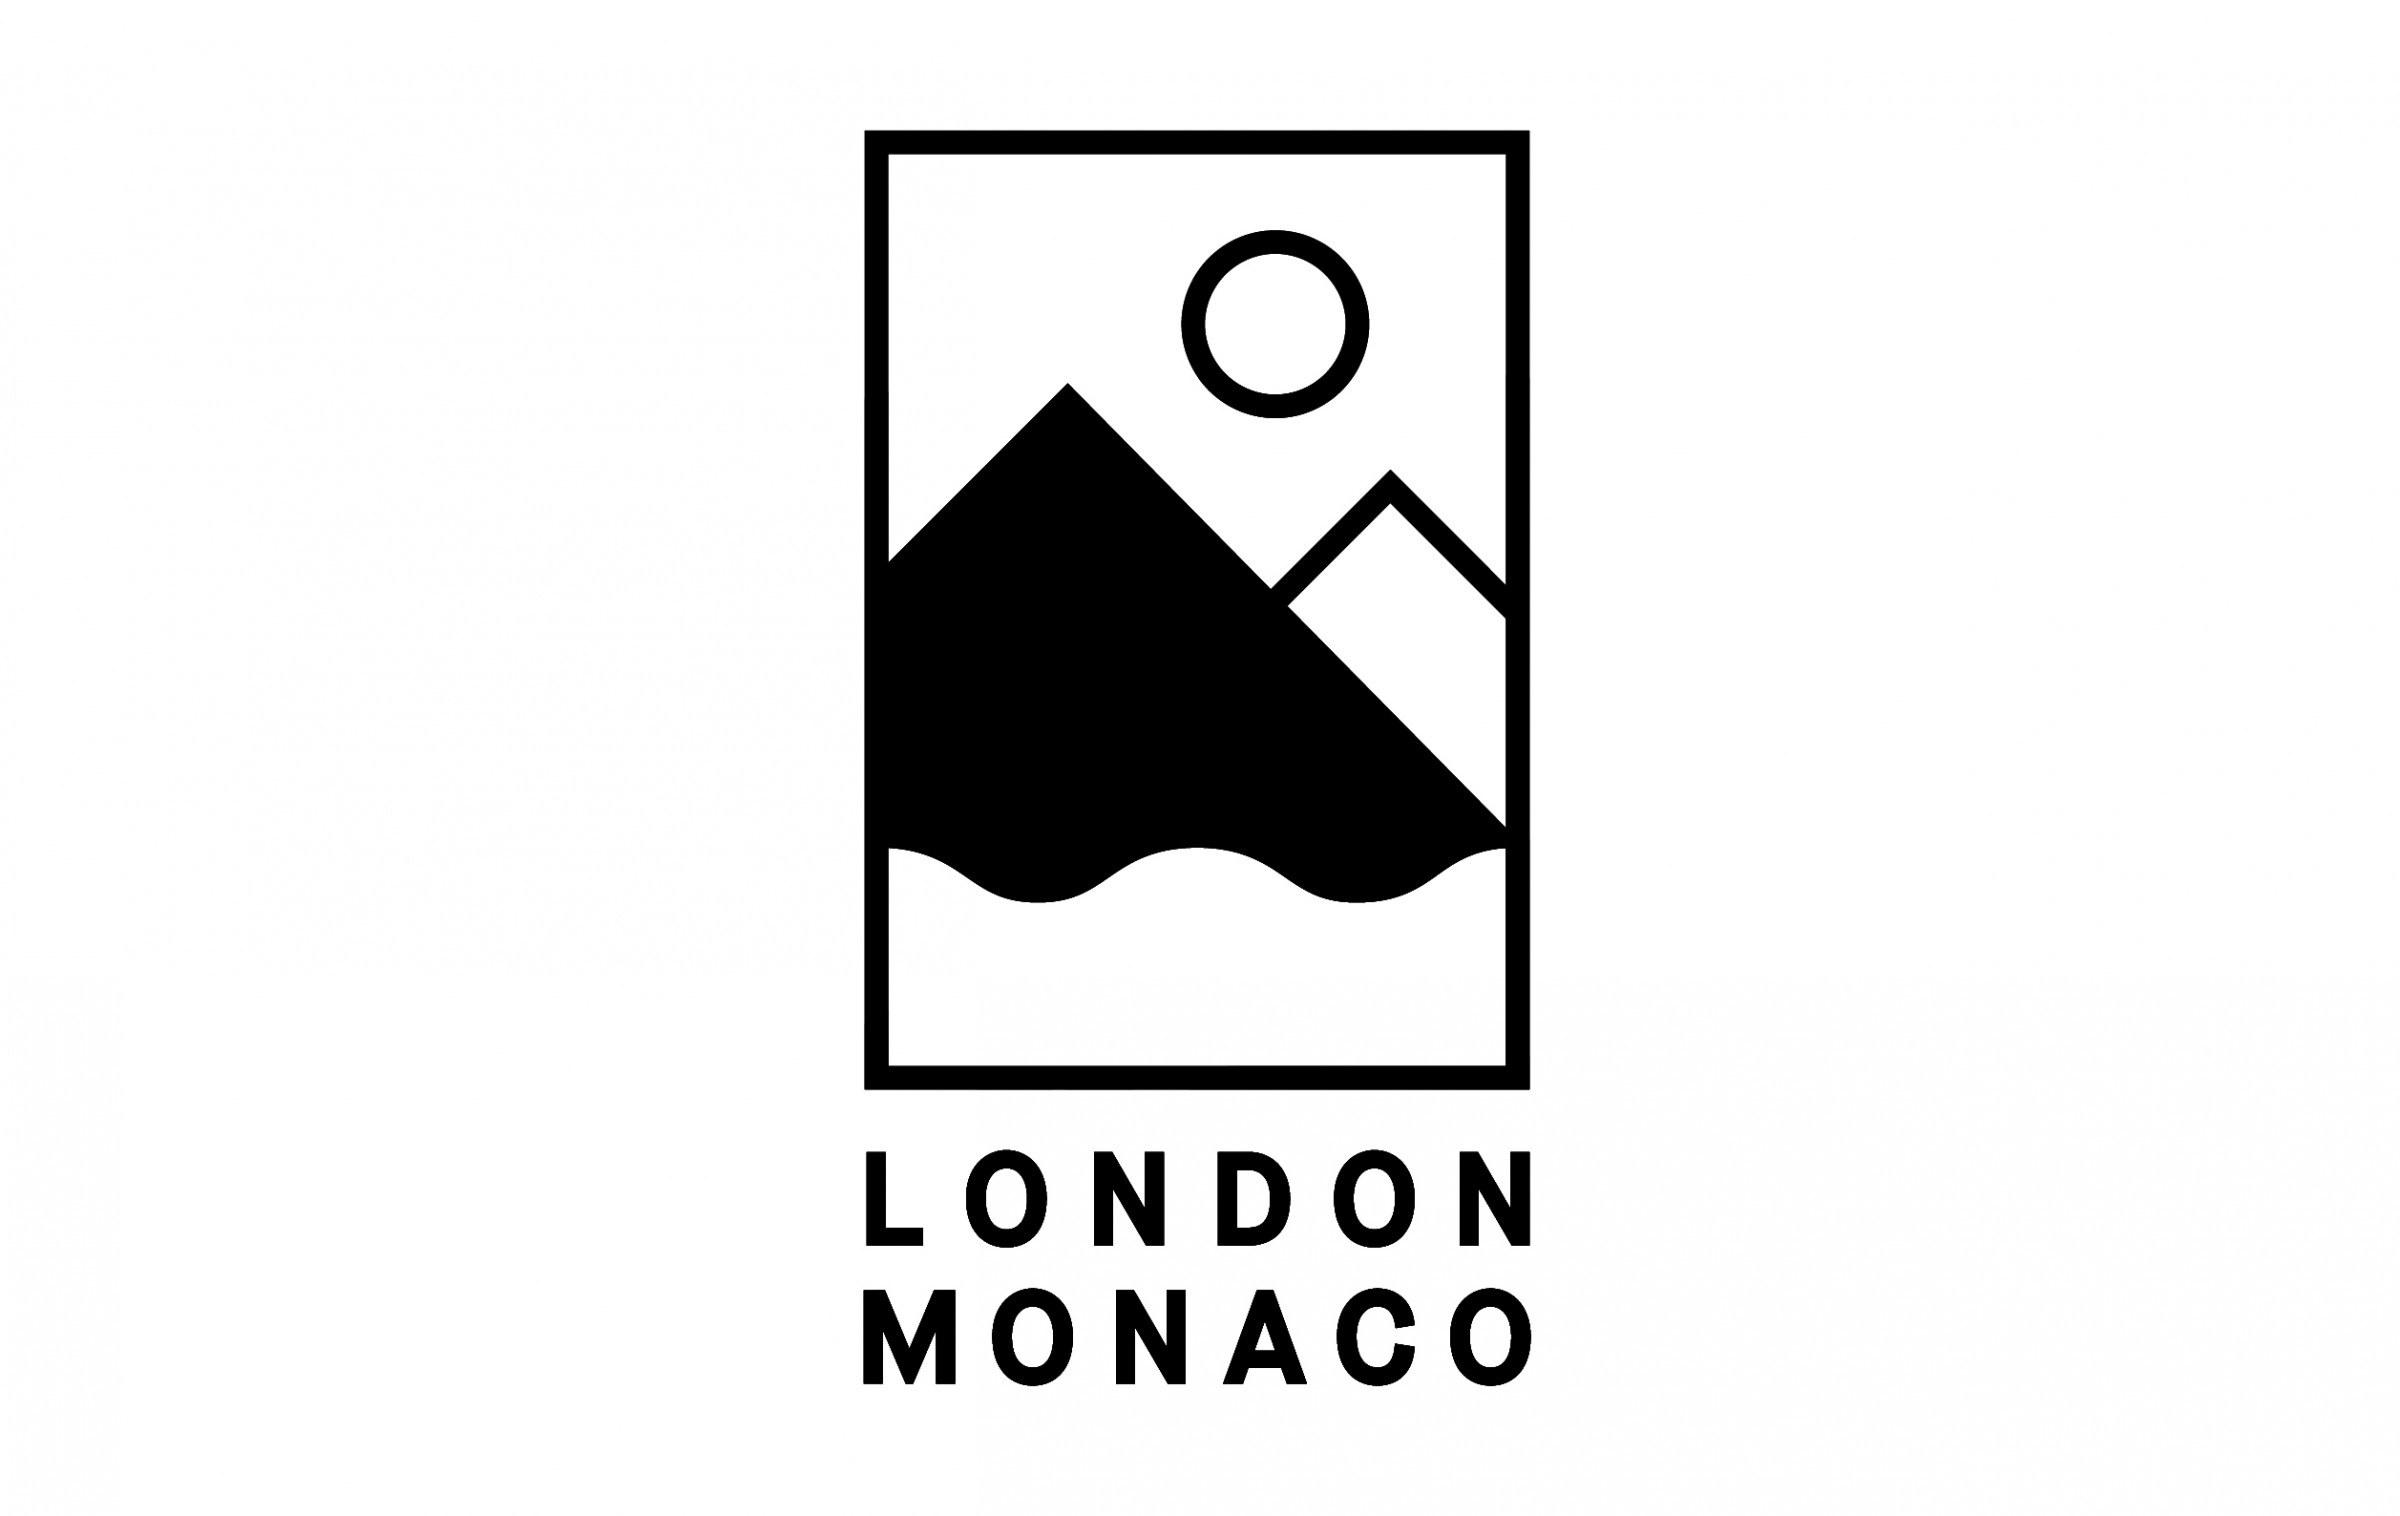 London-Monaco-symbol-Lockup-08-JPG-landscape-2400x1516.jpg